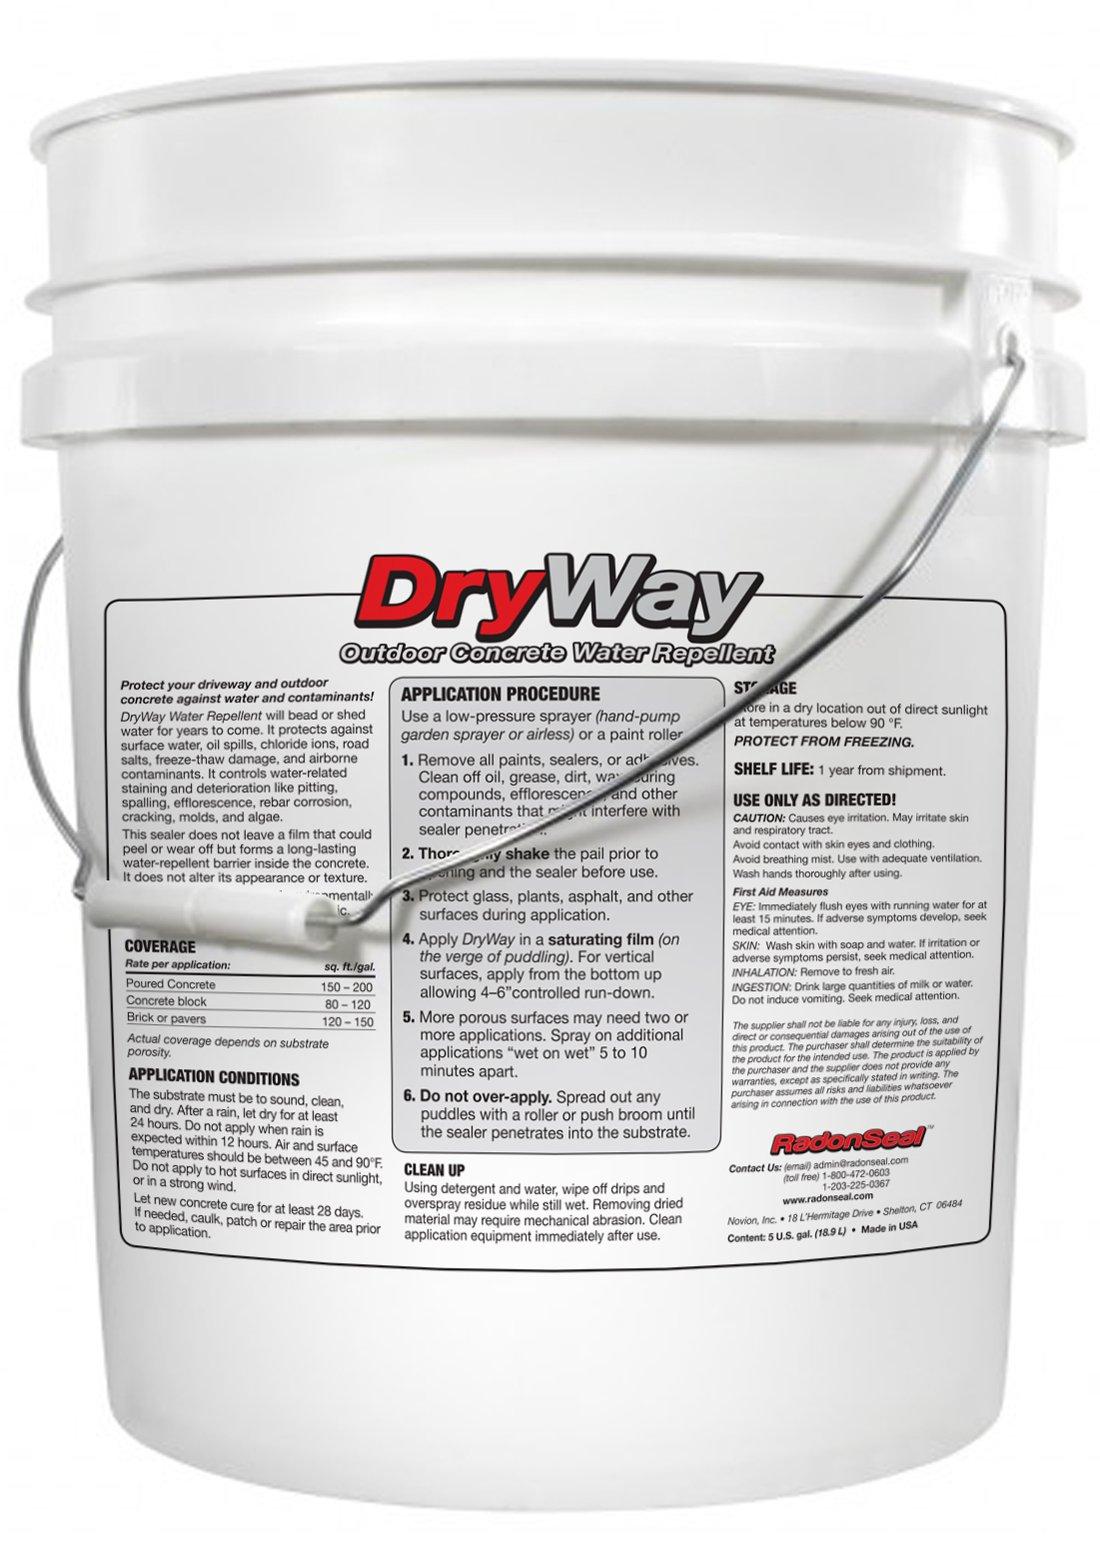 DryWay Water-Repellent Concrete Sealer | Penetrating Silane & Siloxane | Driveways, Garages, Patios, Pool Decks | Concrete, Brick & Pavers | Flat Finish | Interior/Exterior (5-Gallon)